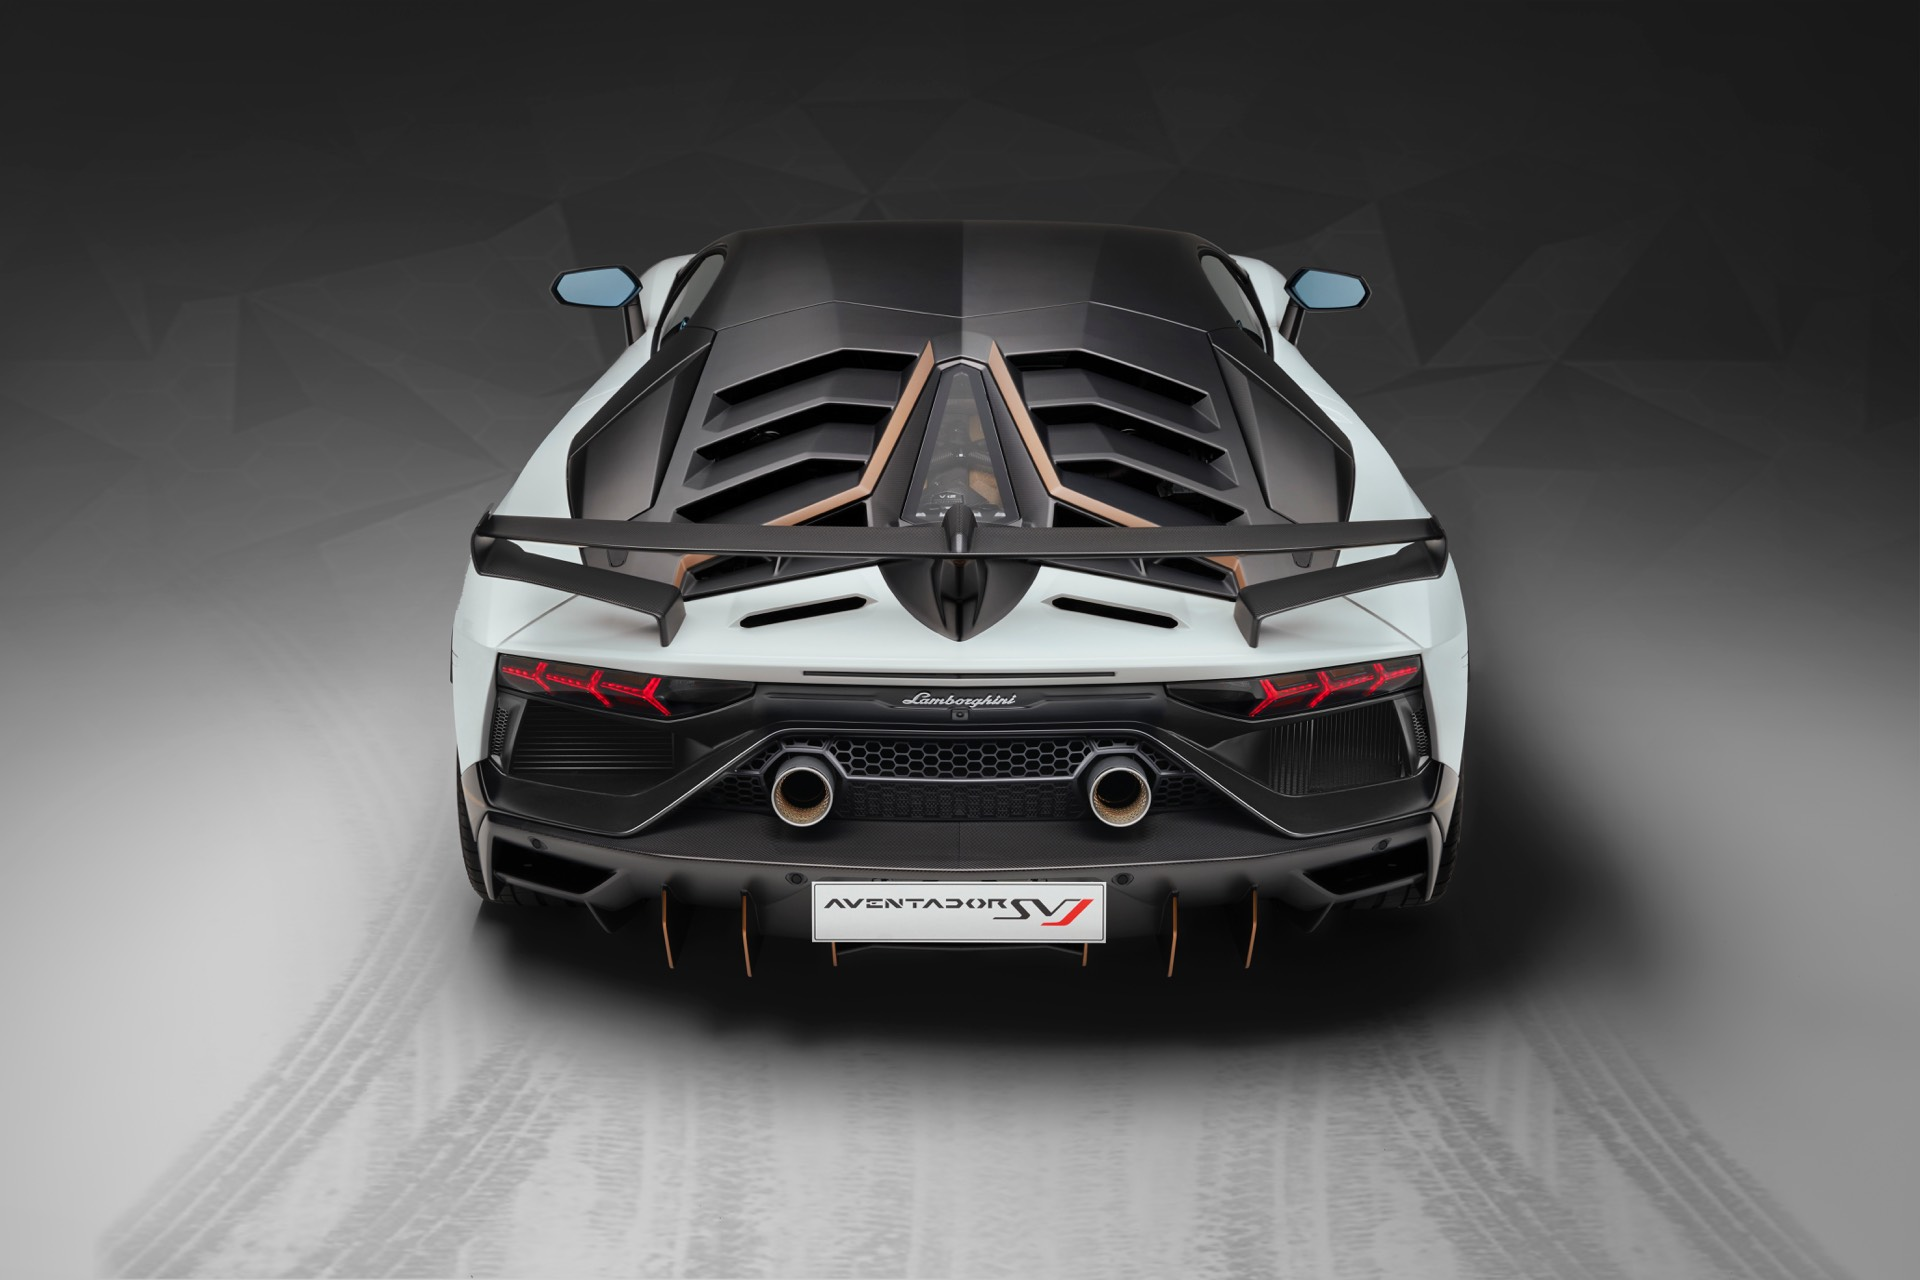 Lamborghini Aventador Svj Officially Revealed Gtspirit